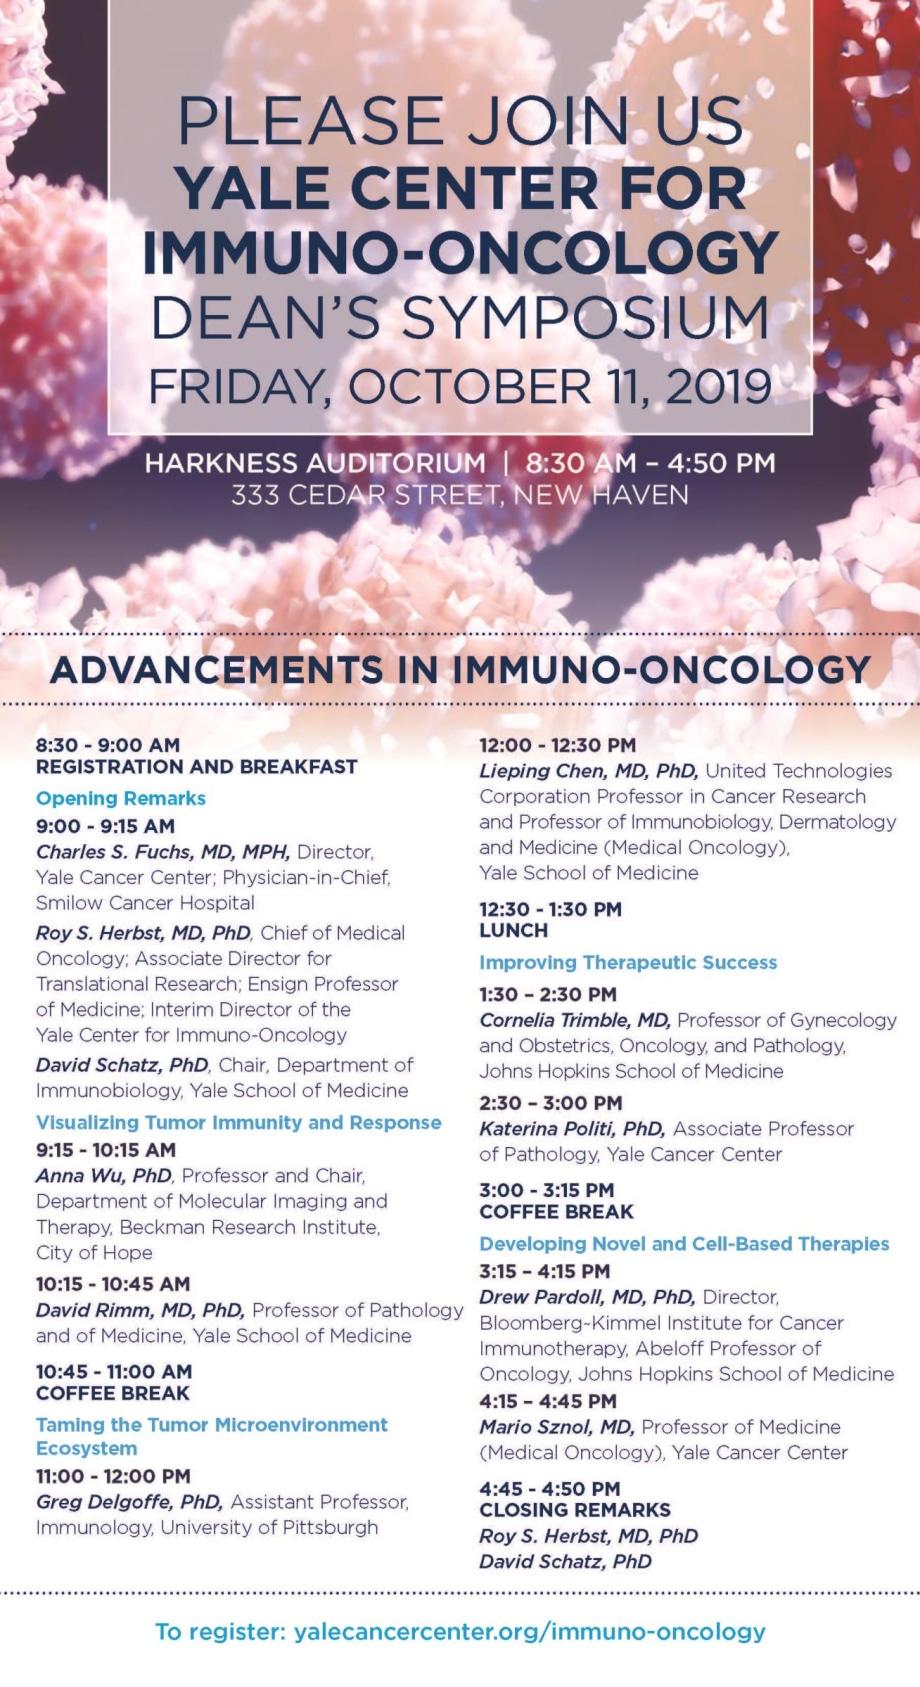 Immuno-Oncology Symposium invite cover